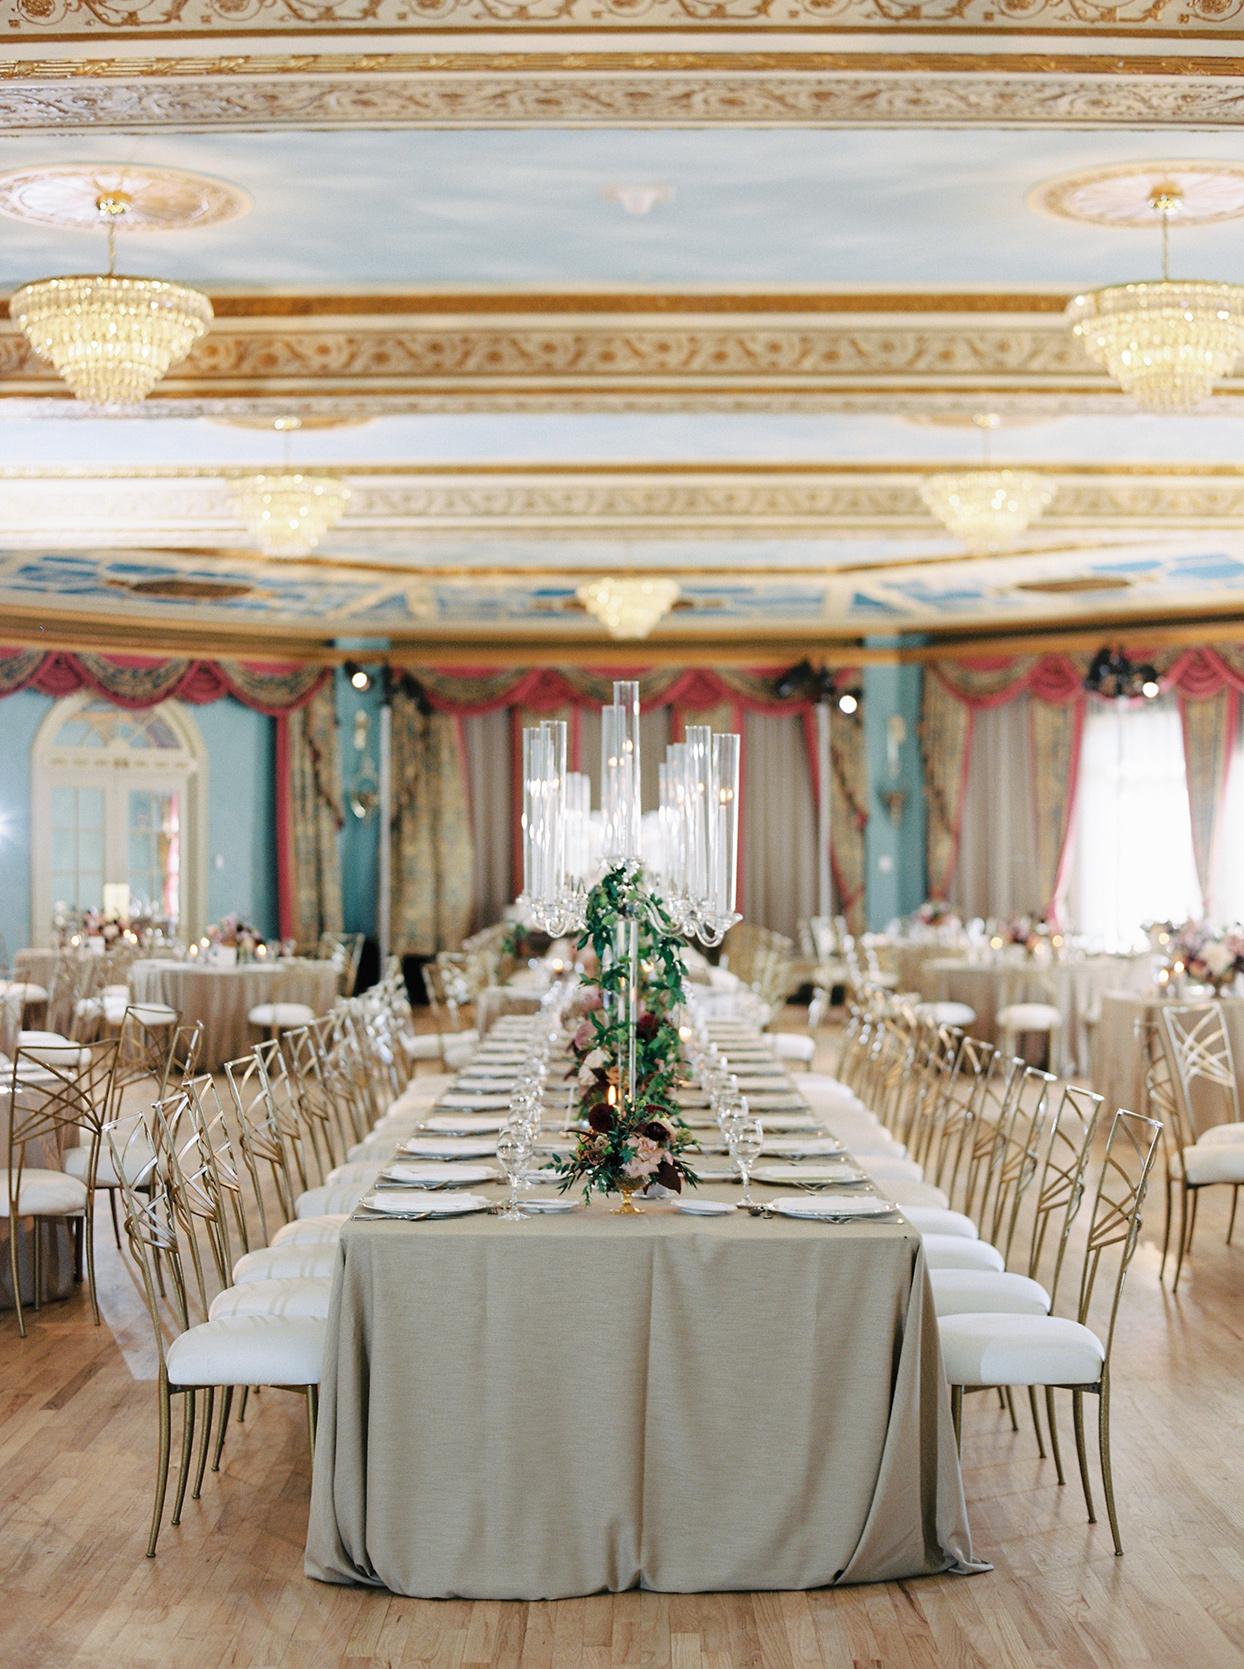 katie nicholas wedding reception elegant long tables in ballroom